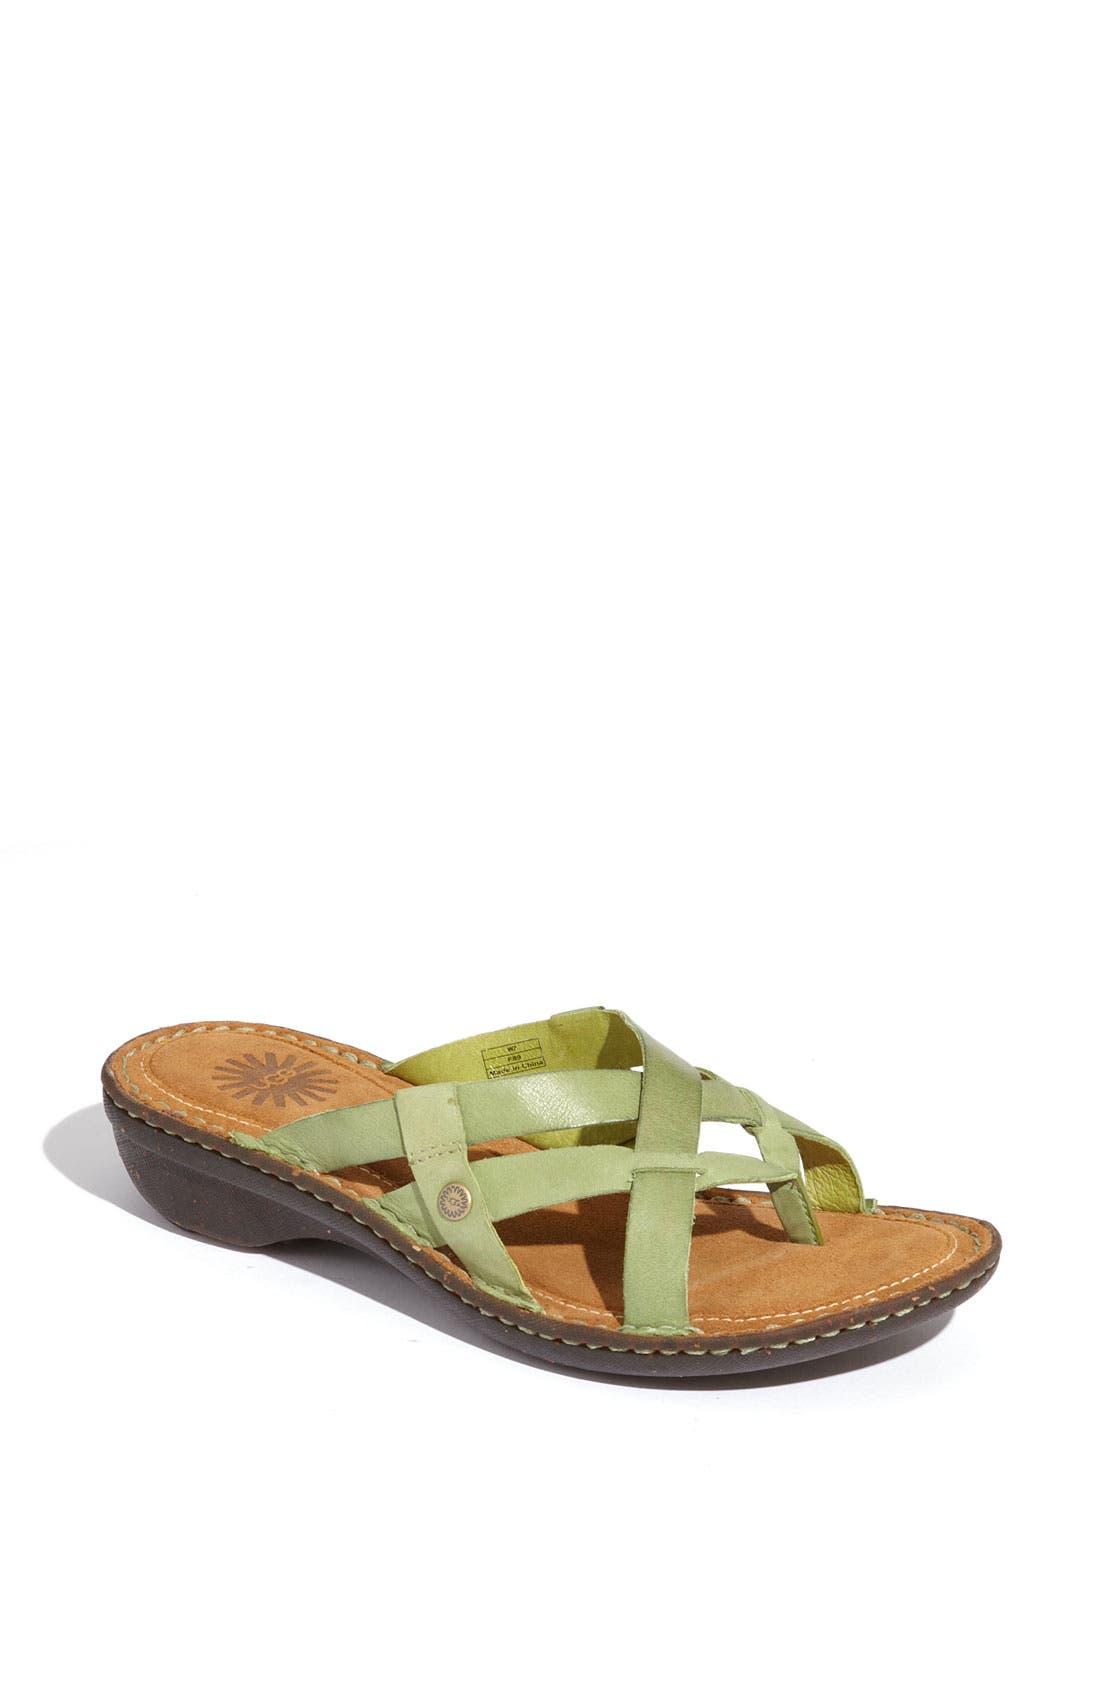 Main Image - UGG® Australia 'Lanni' Sandal